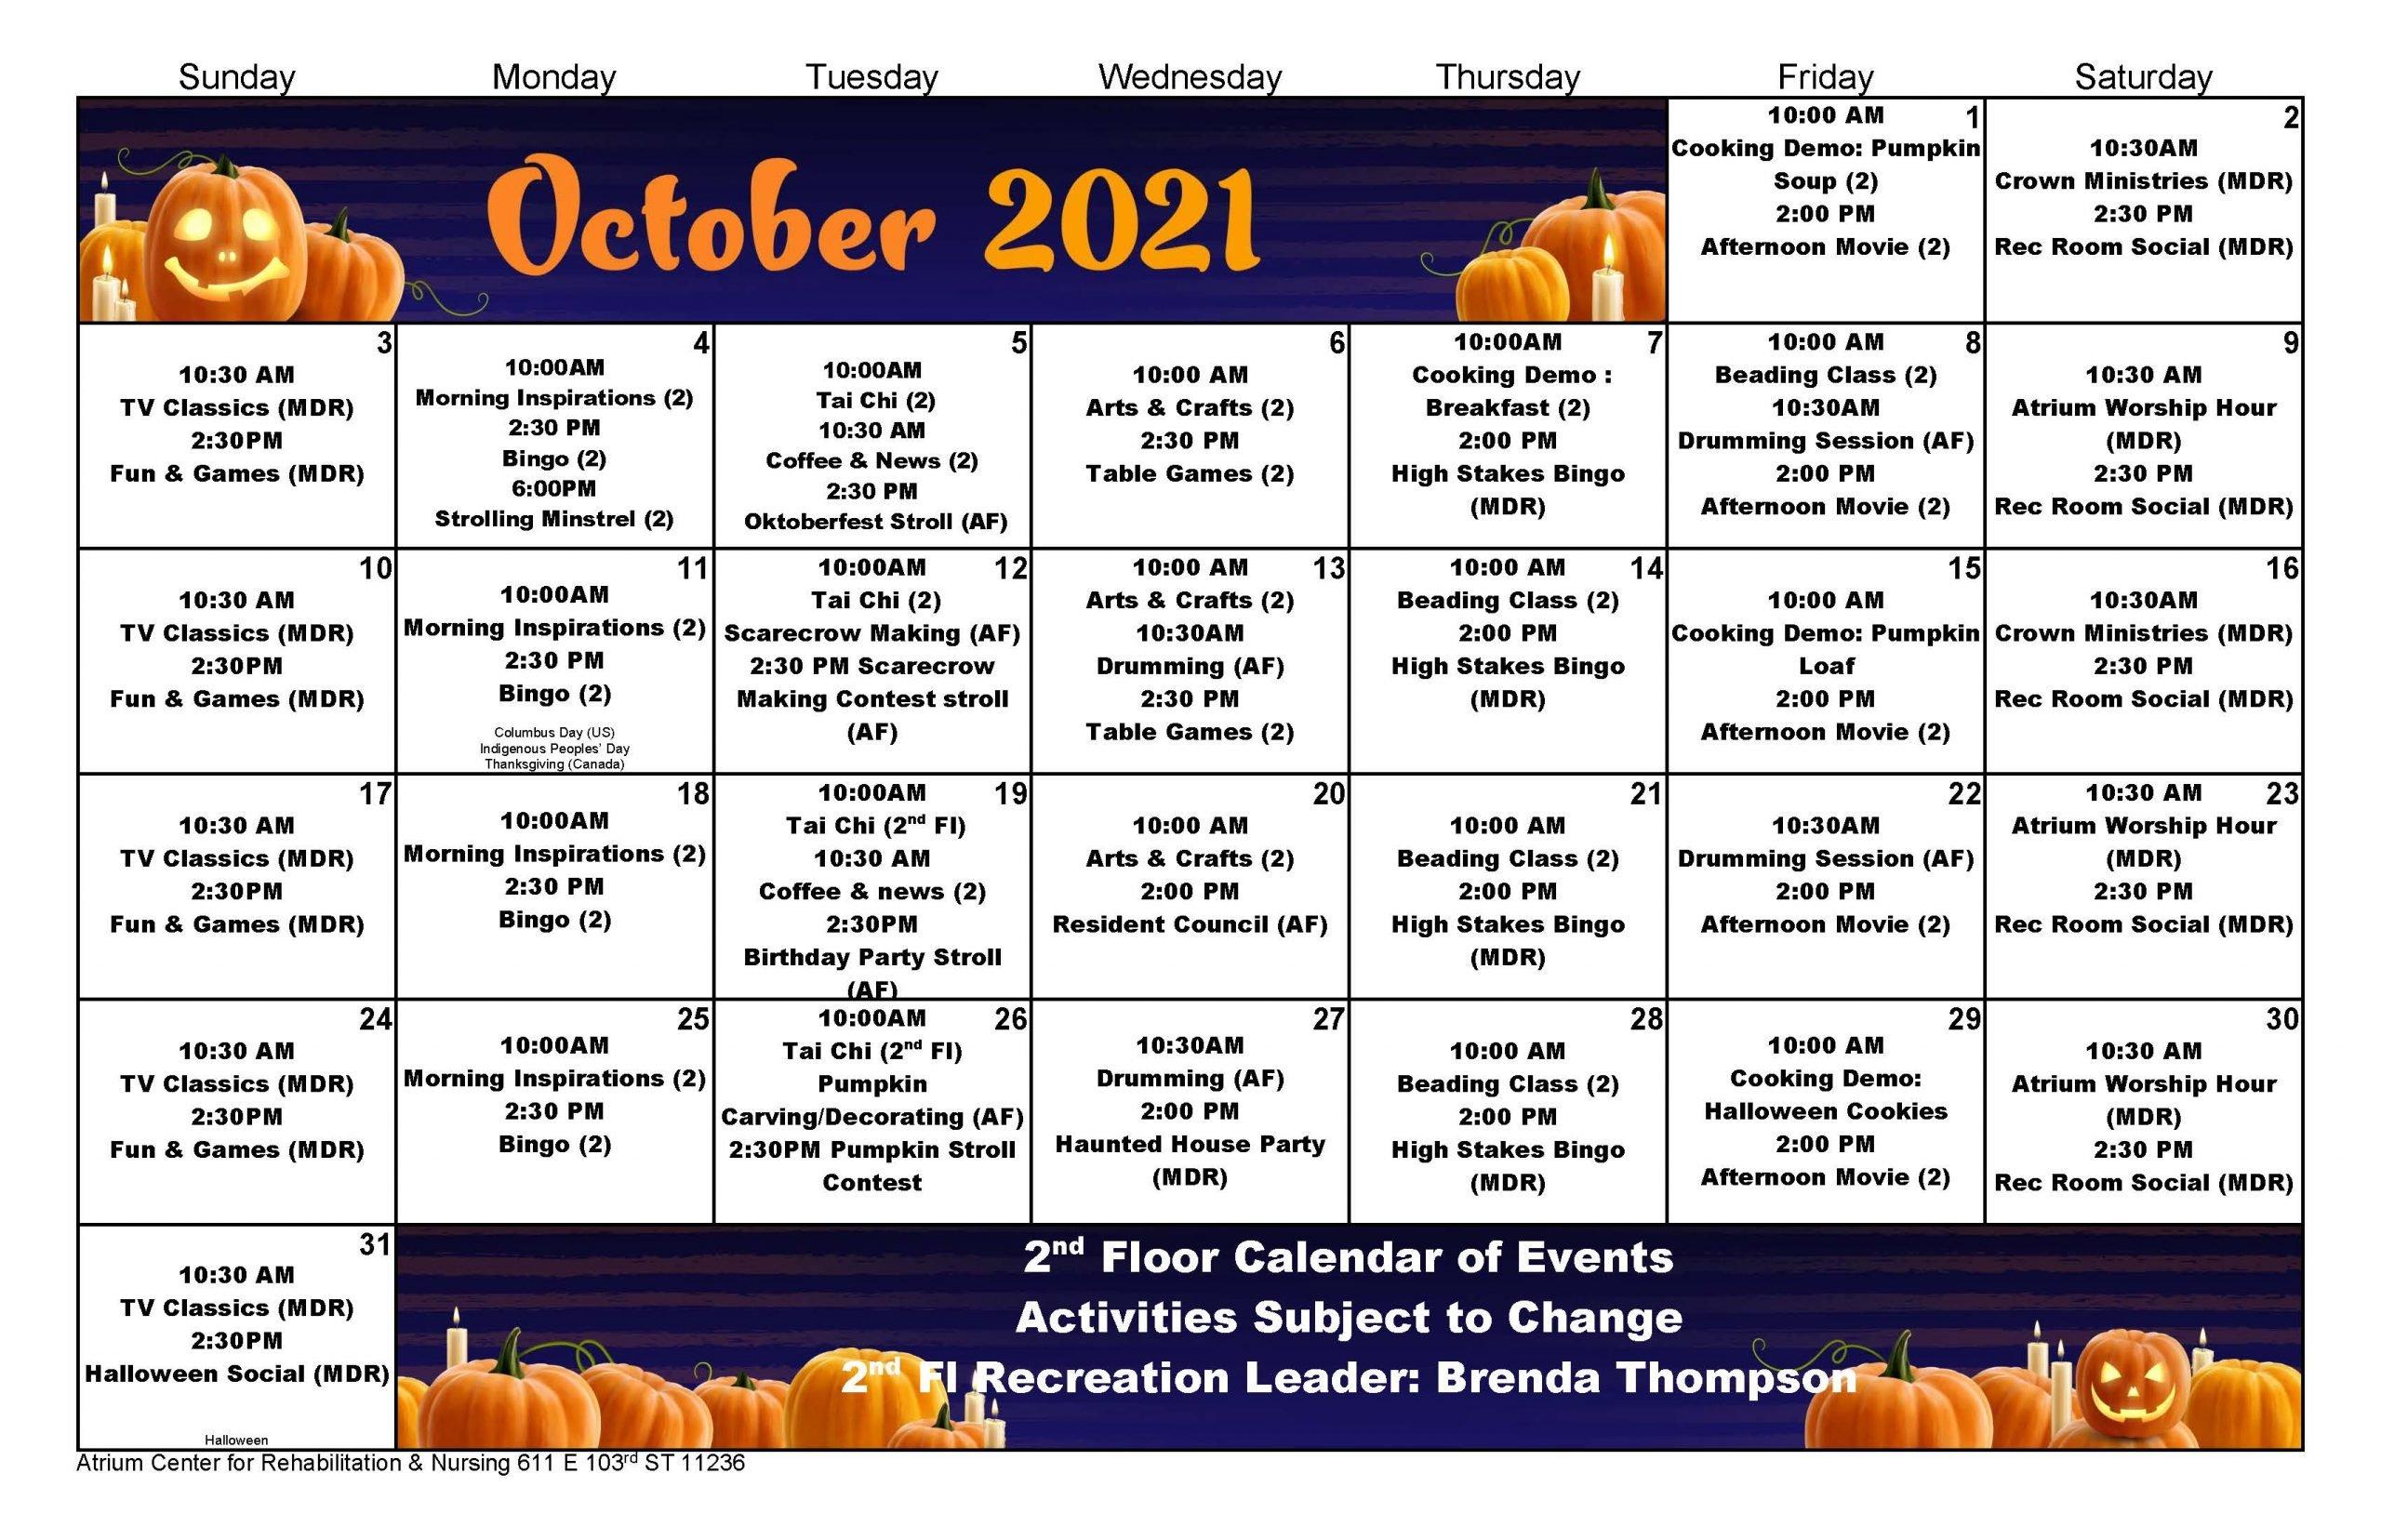 Atrium Center October 2021 Calendar - 2nd Floor